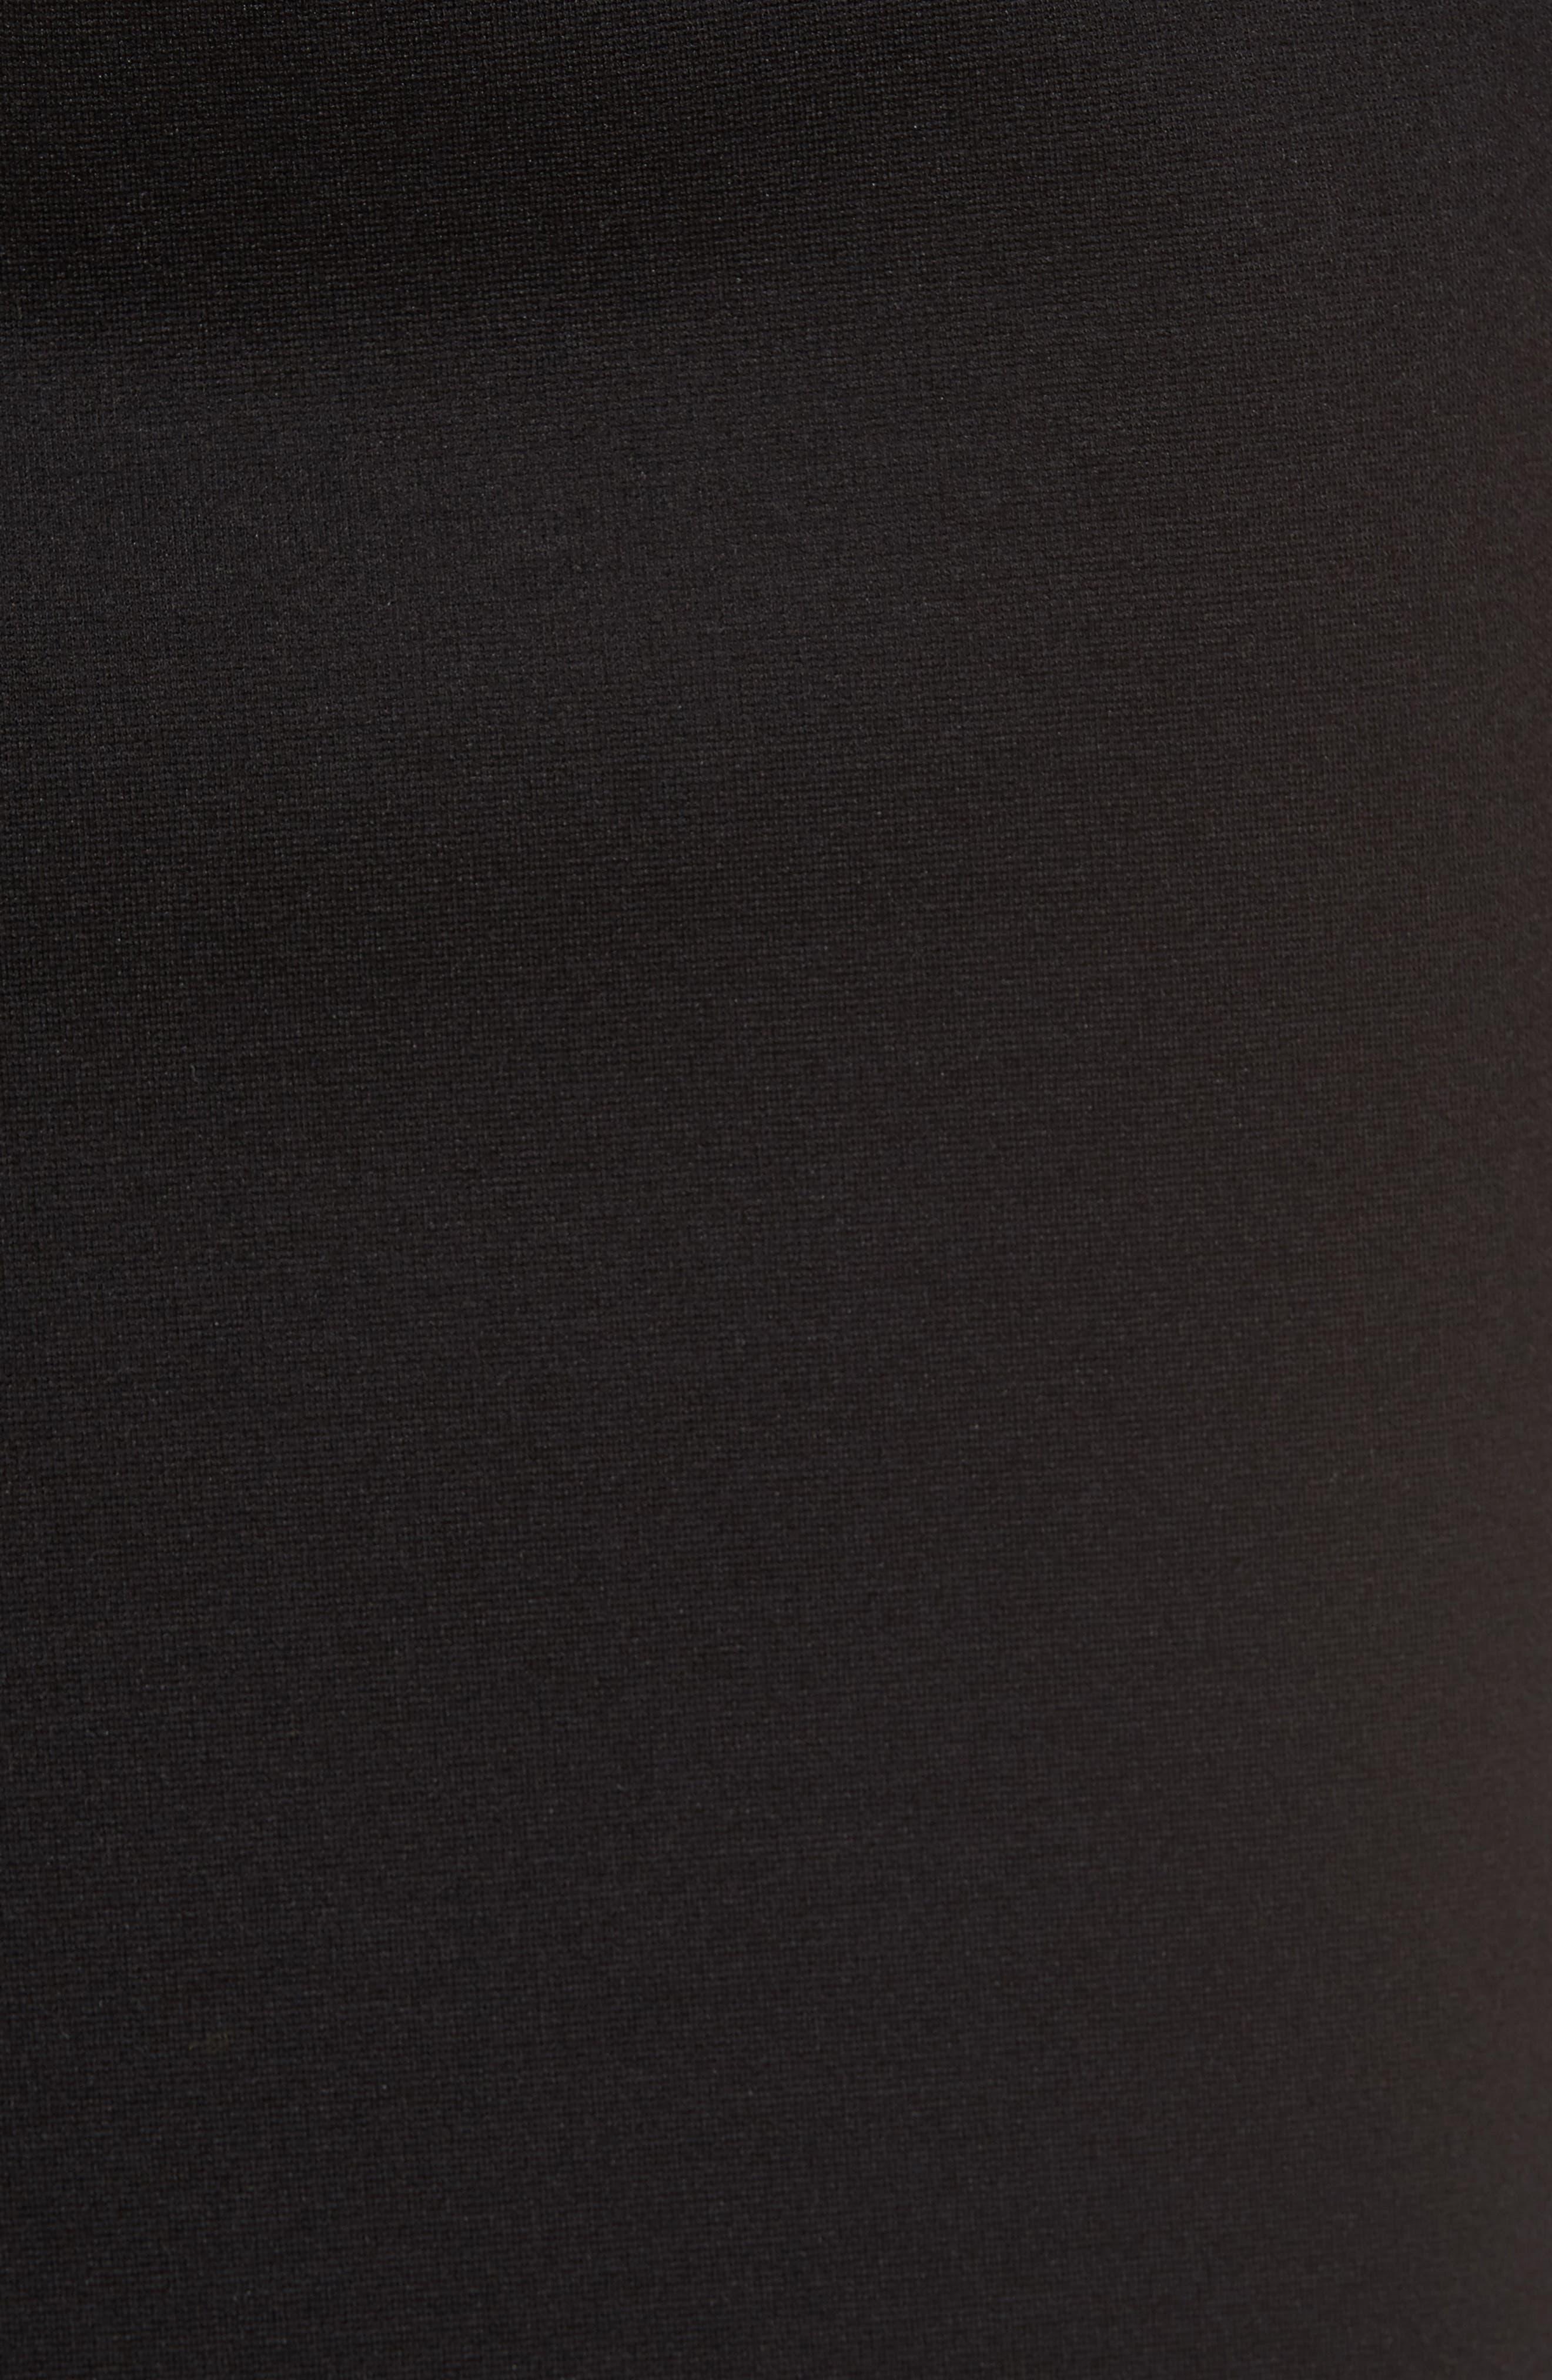 Tencel<sup>®</sup> Blend Pencil Skirt,                             Alternate thumbnail 5, color,                             001